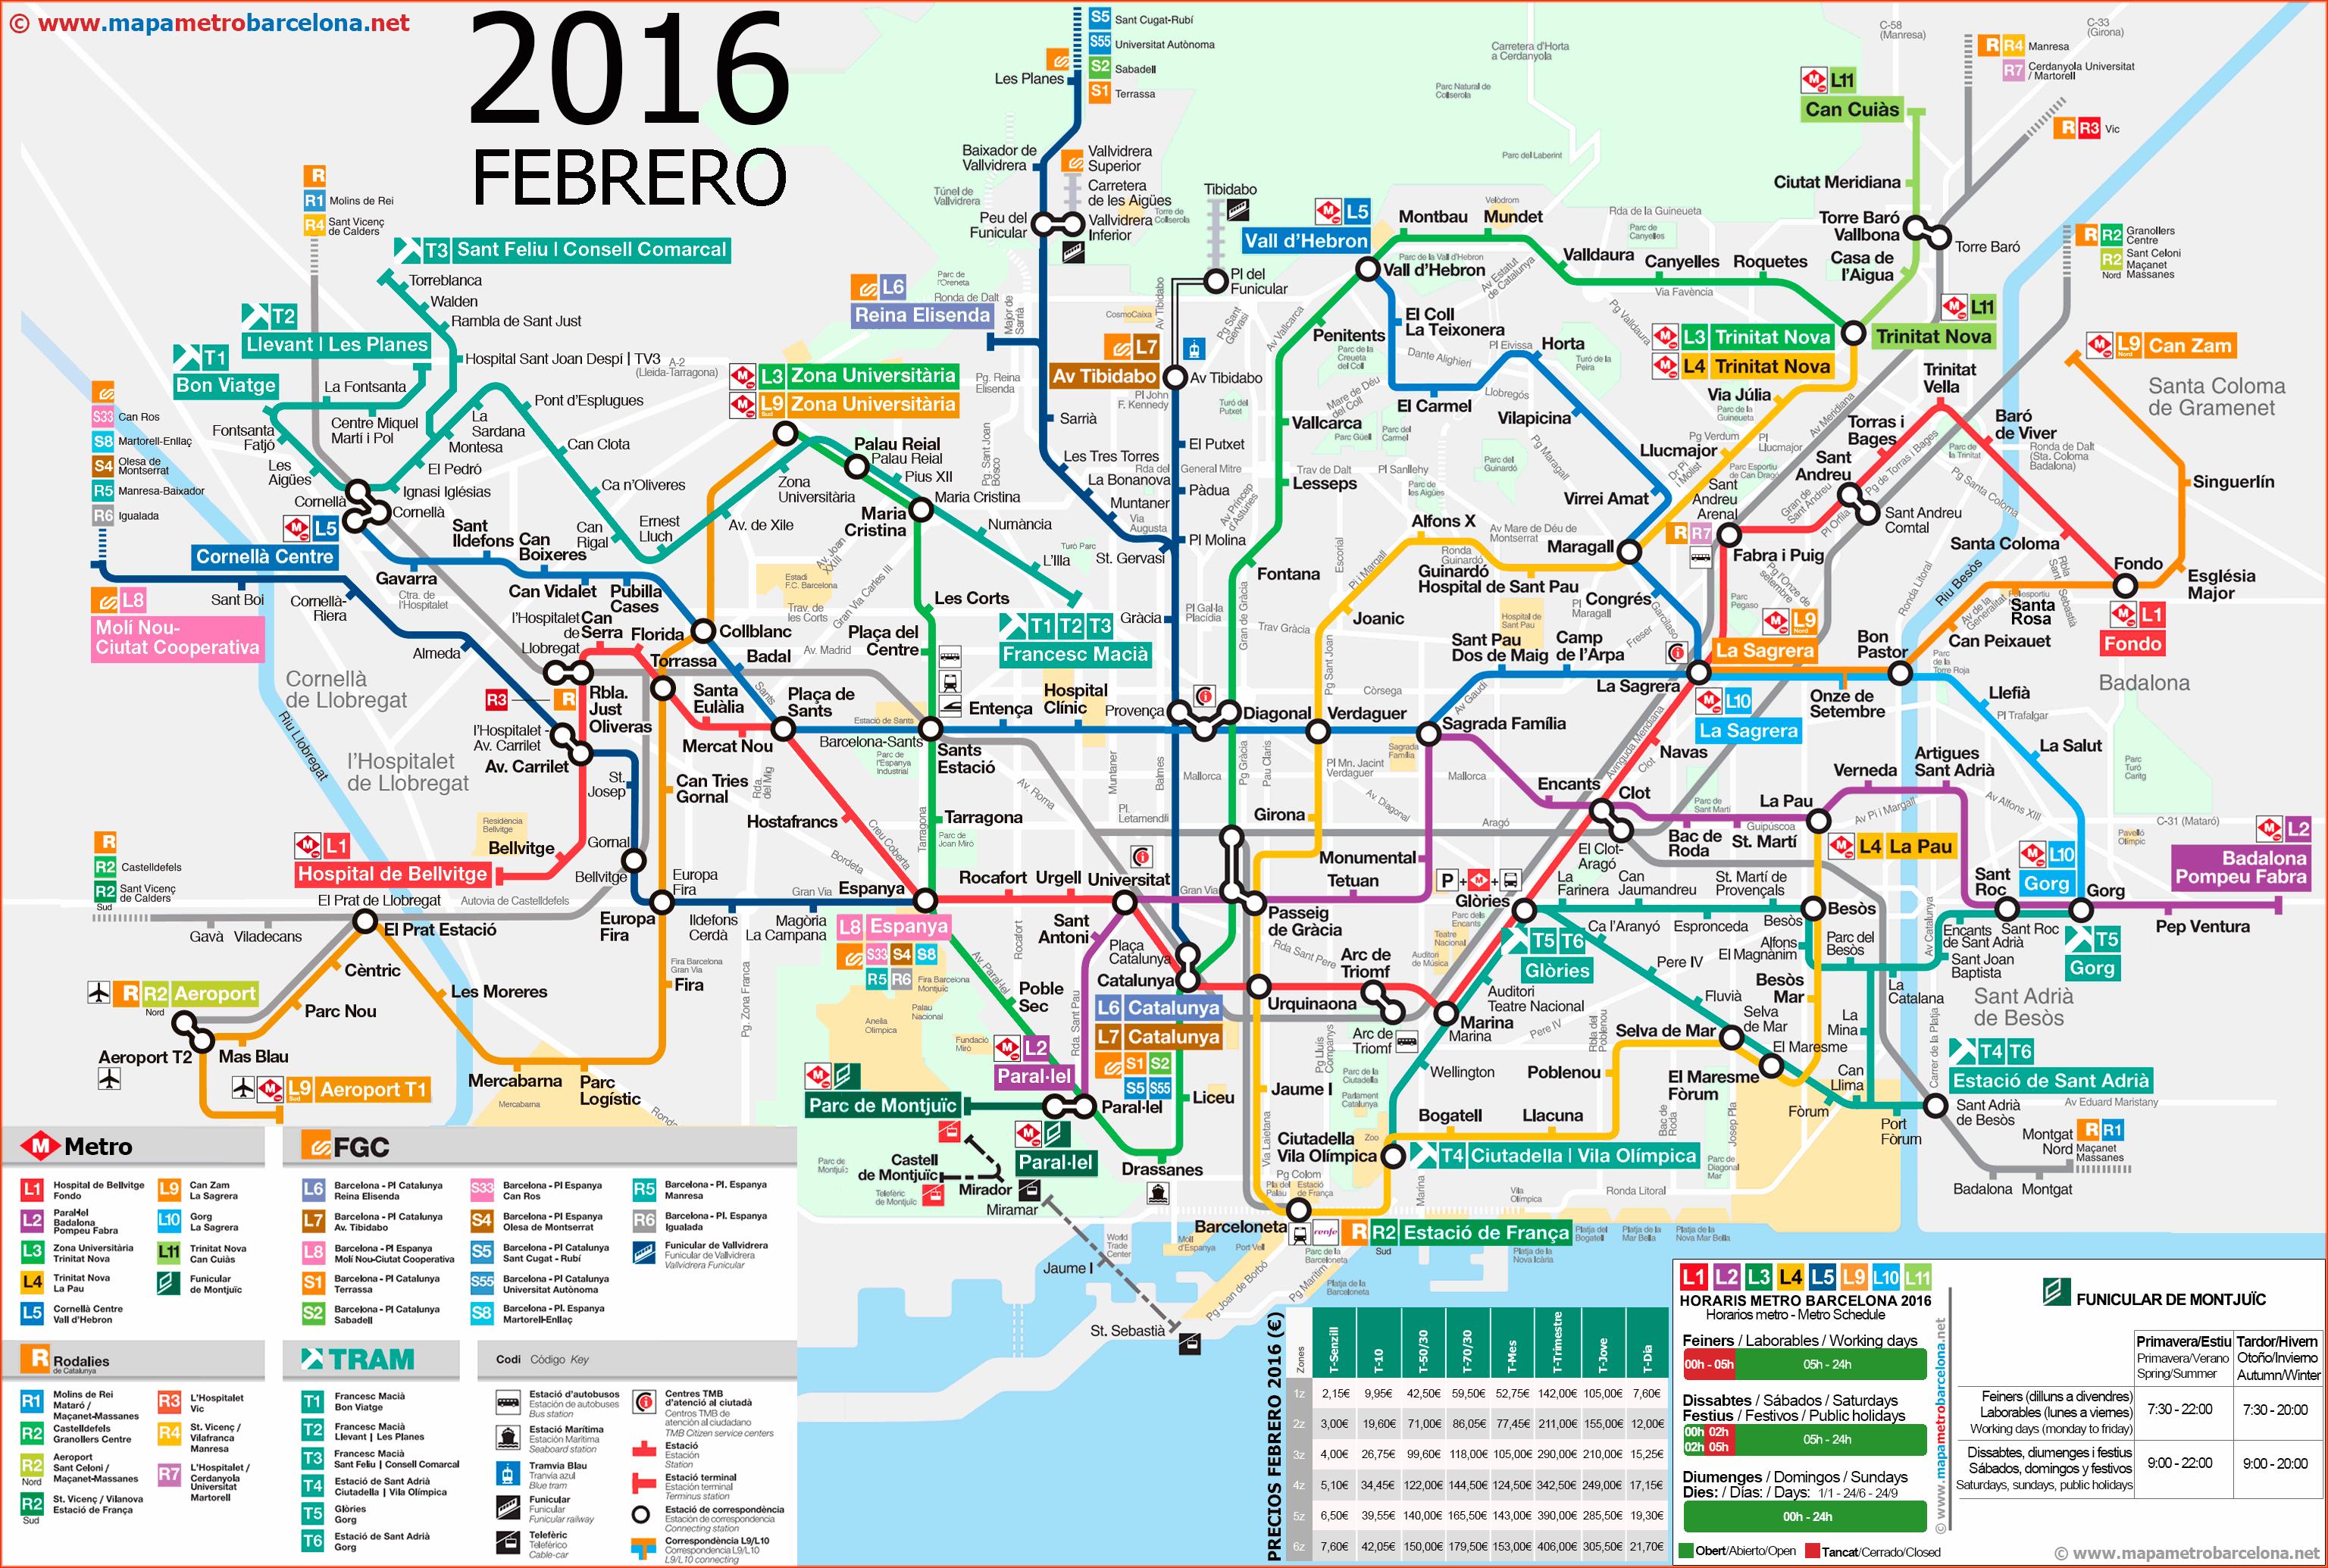 mapa metro barcelona pdf Index of /wp content/uploads/2016/04/ mapa metro barcelona pdf